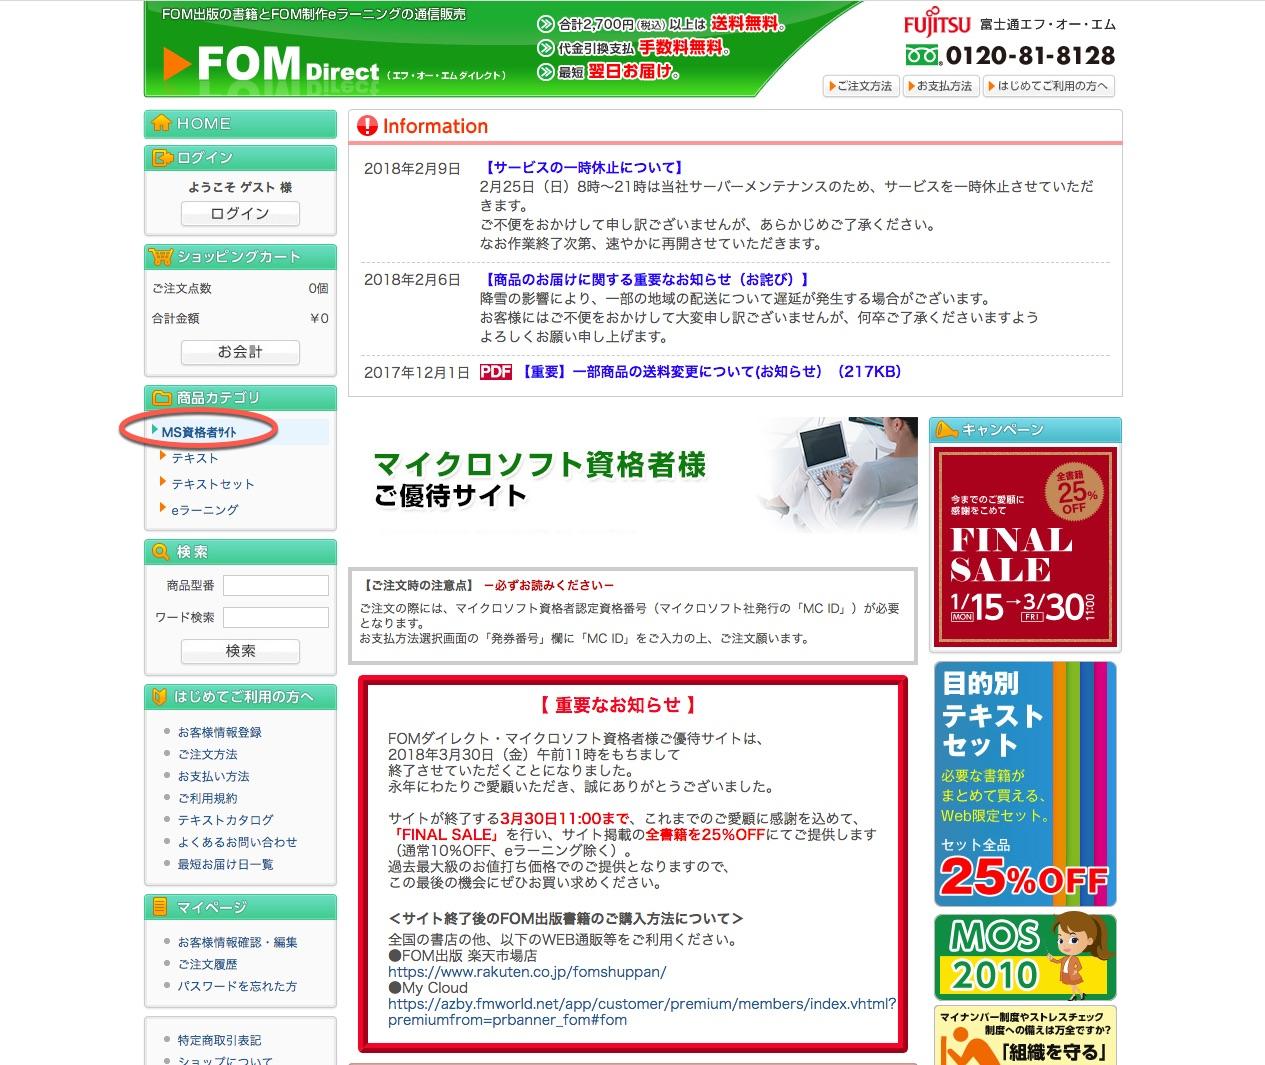 FOM出版 FOM Direct サイトイメージ